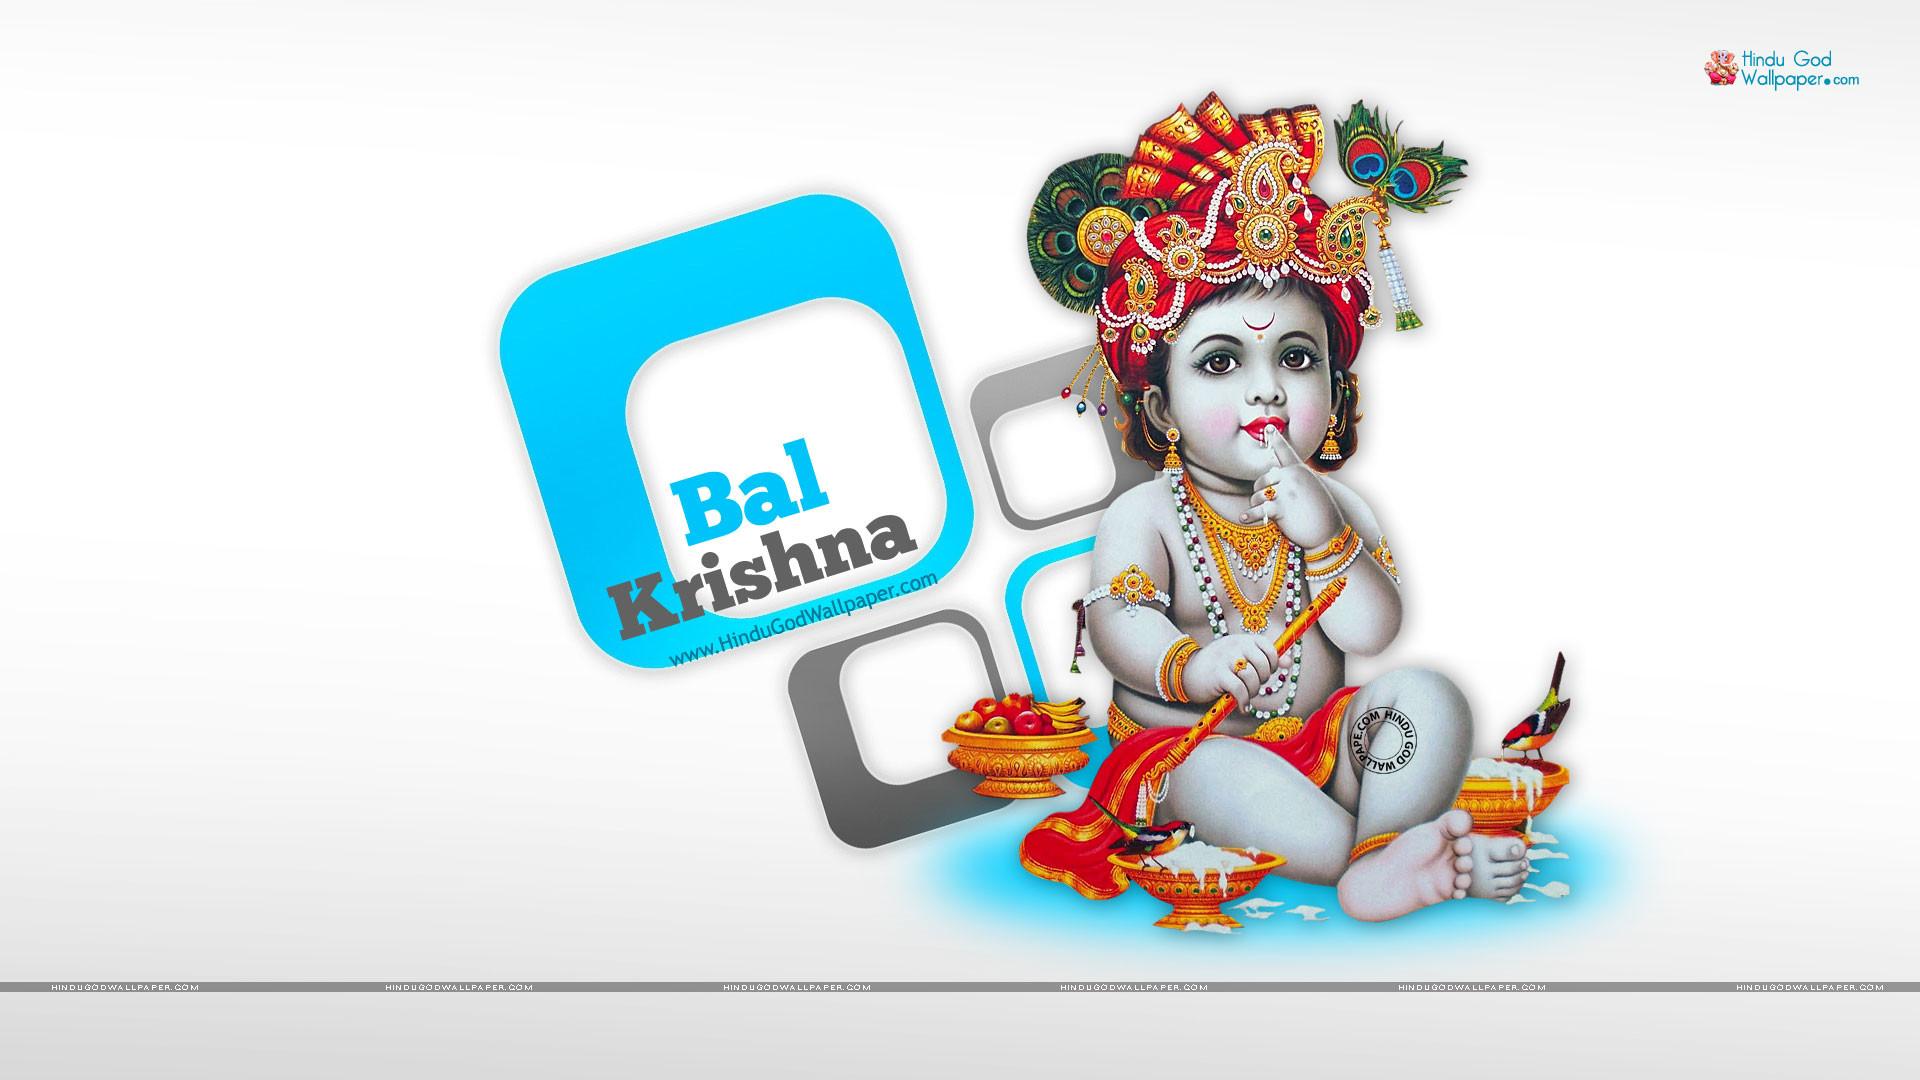 Data-src - Bal Krishna Hd Wallpapers 1080p - HD Wallpaper